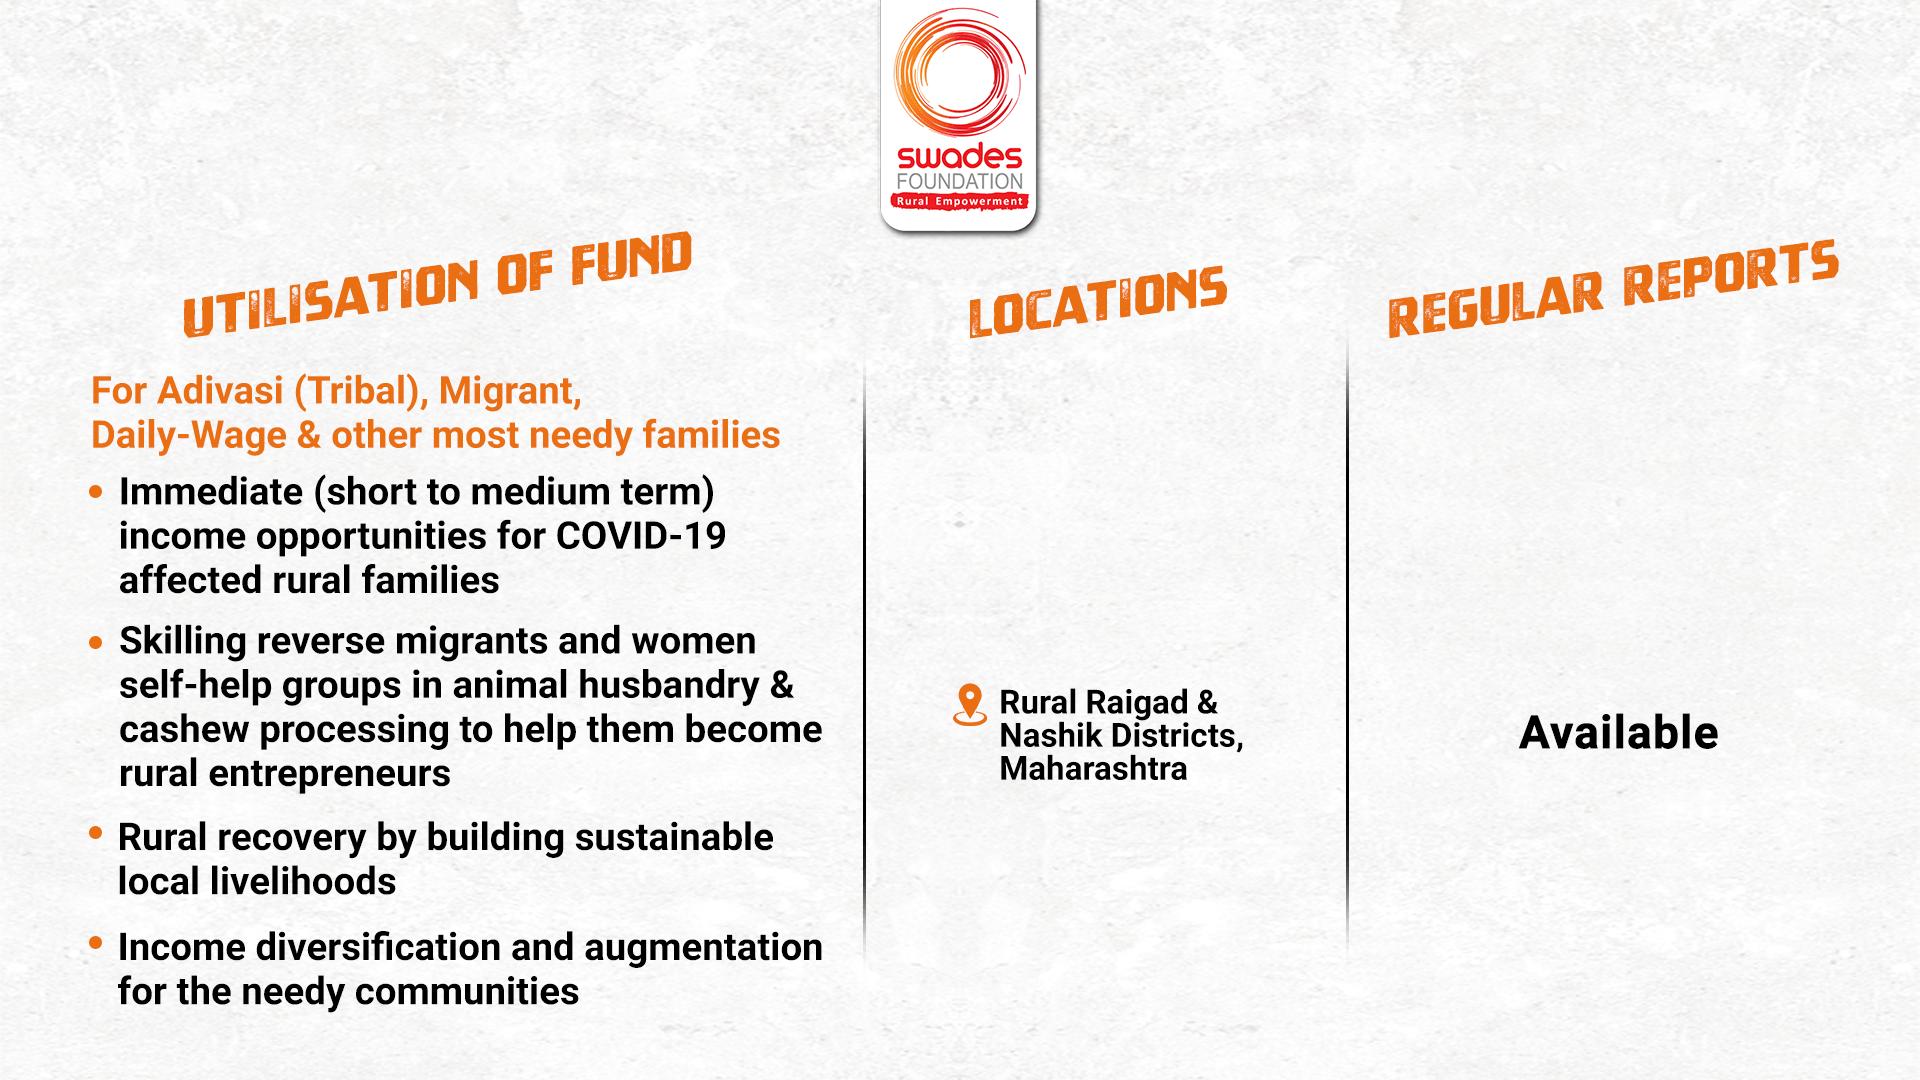 Swades Foundation